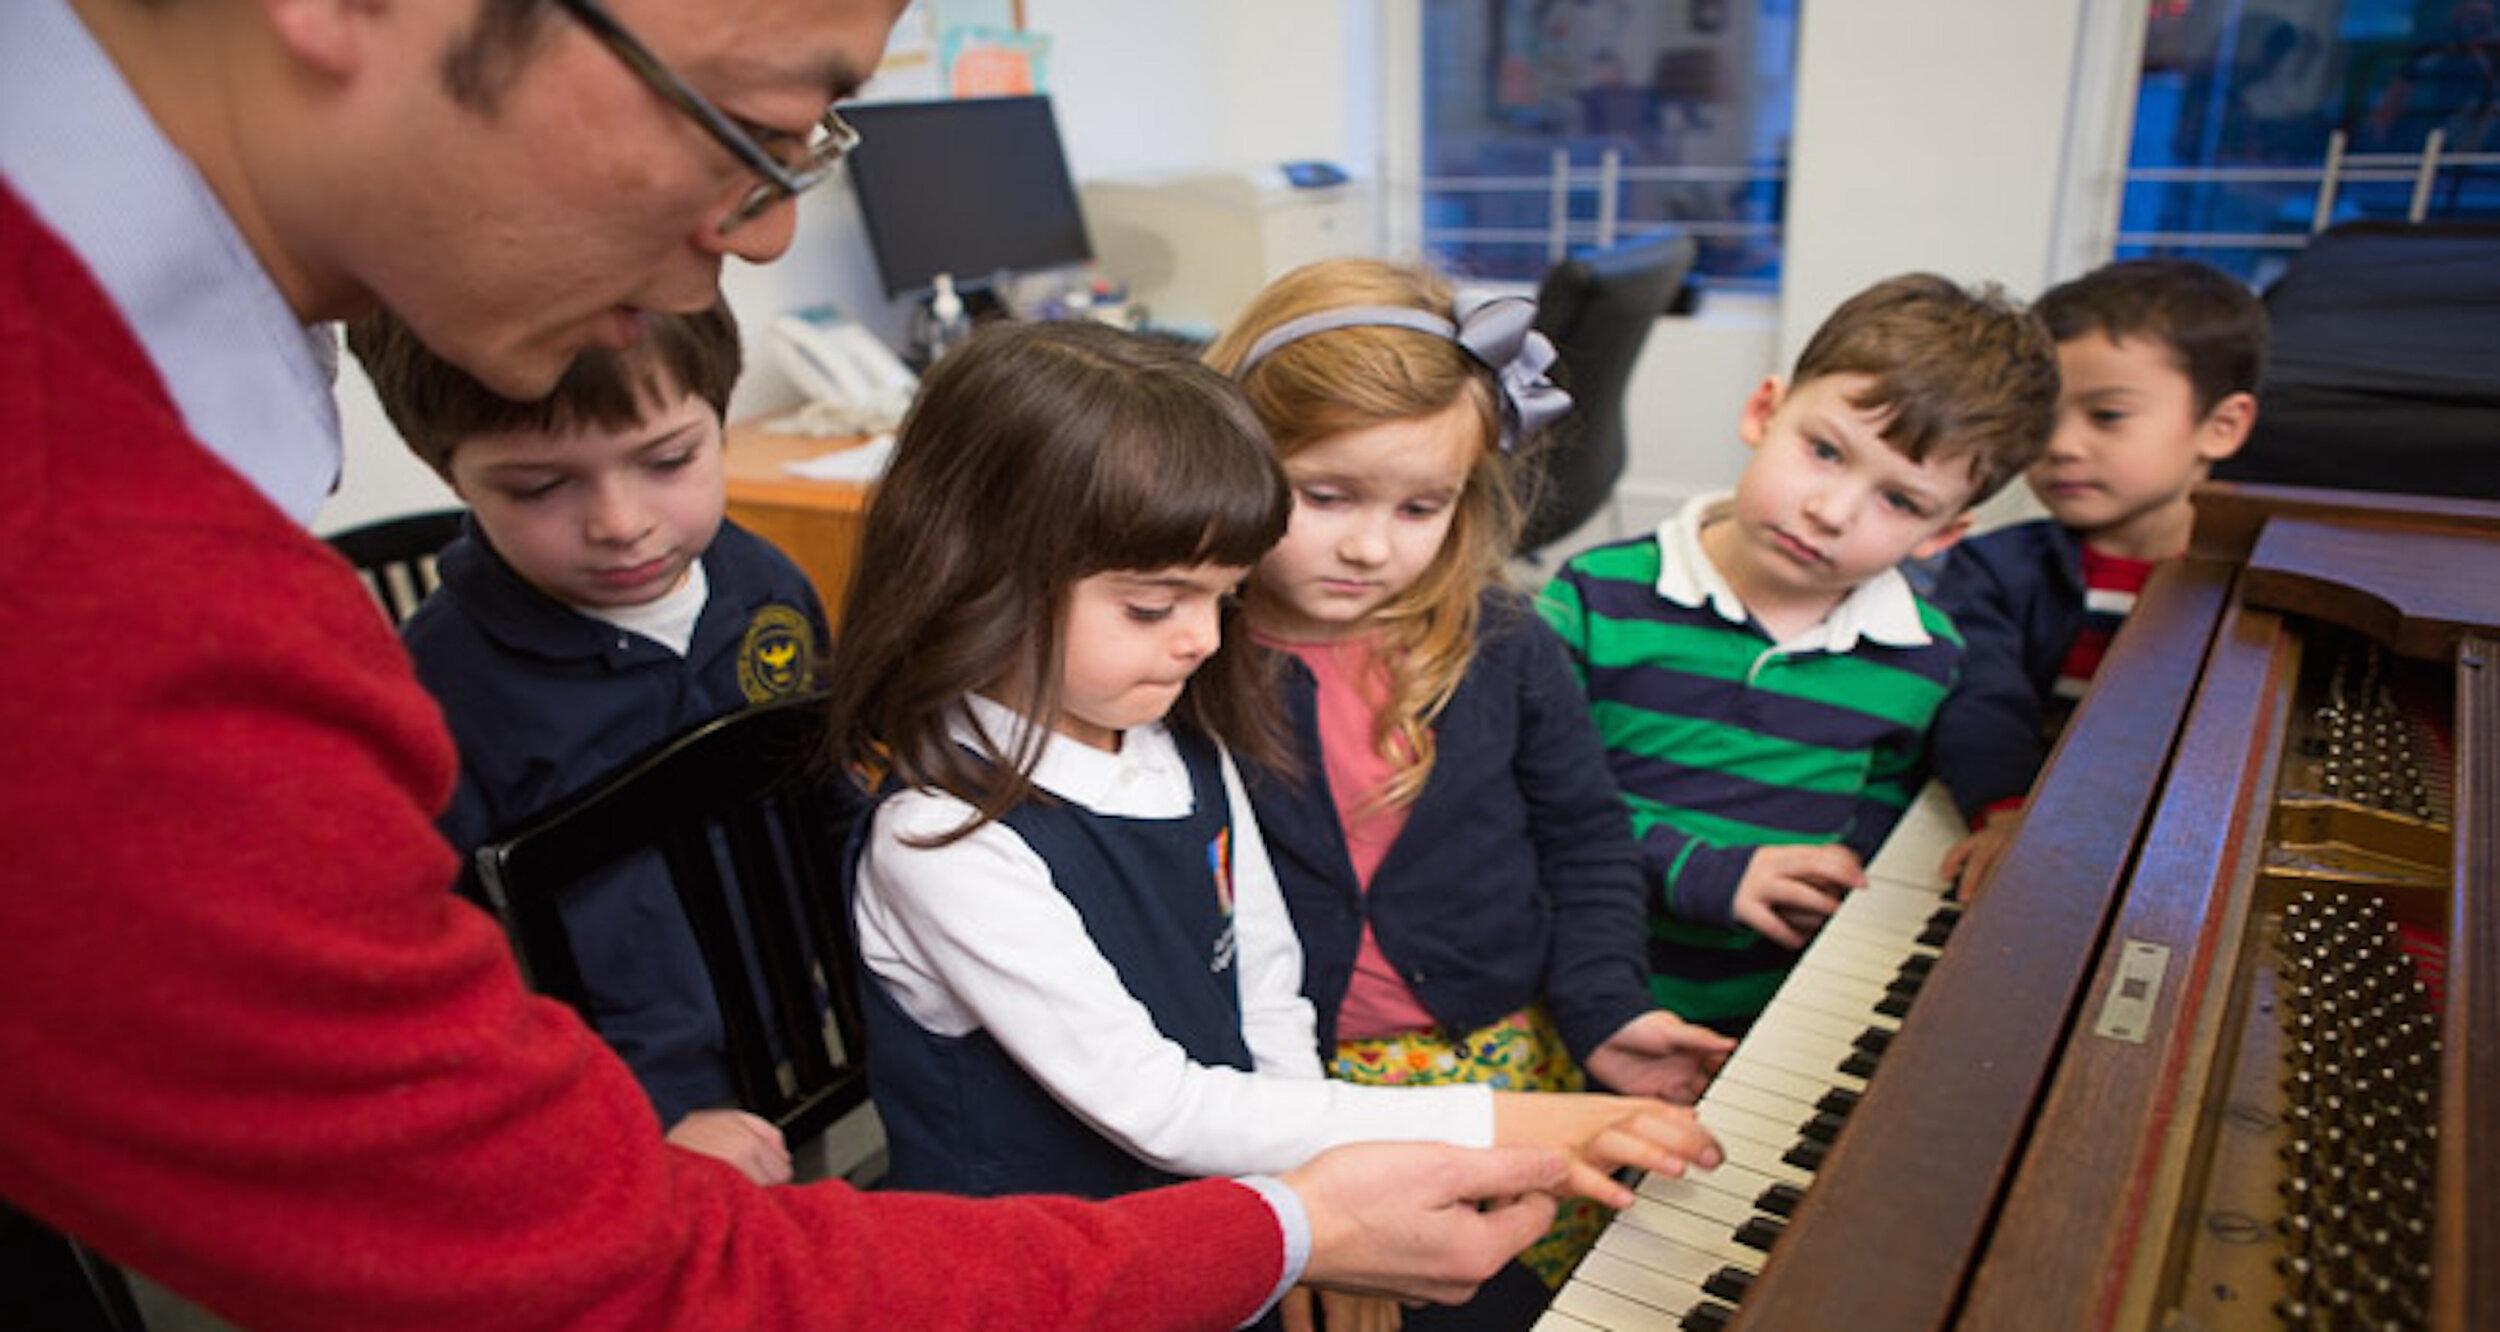 Piano class instruction copy 2.jpg